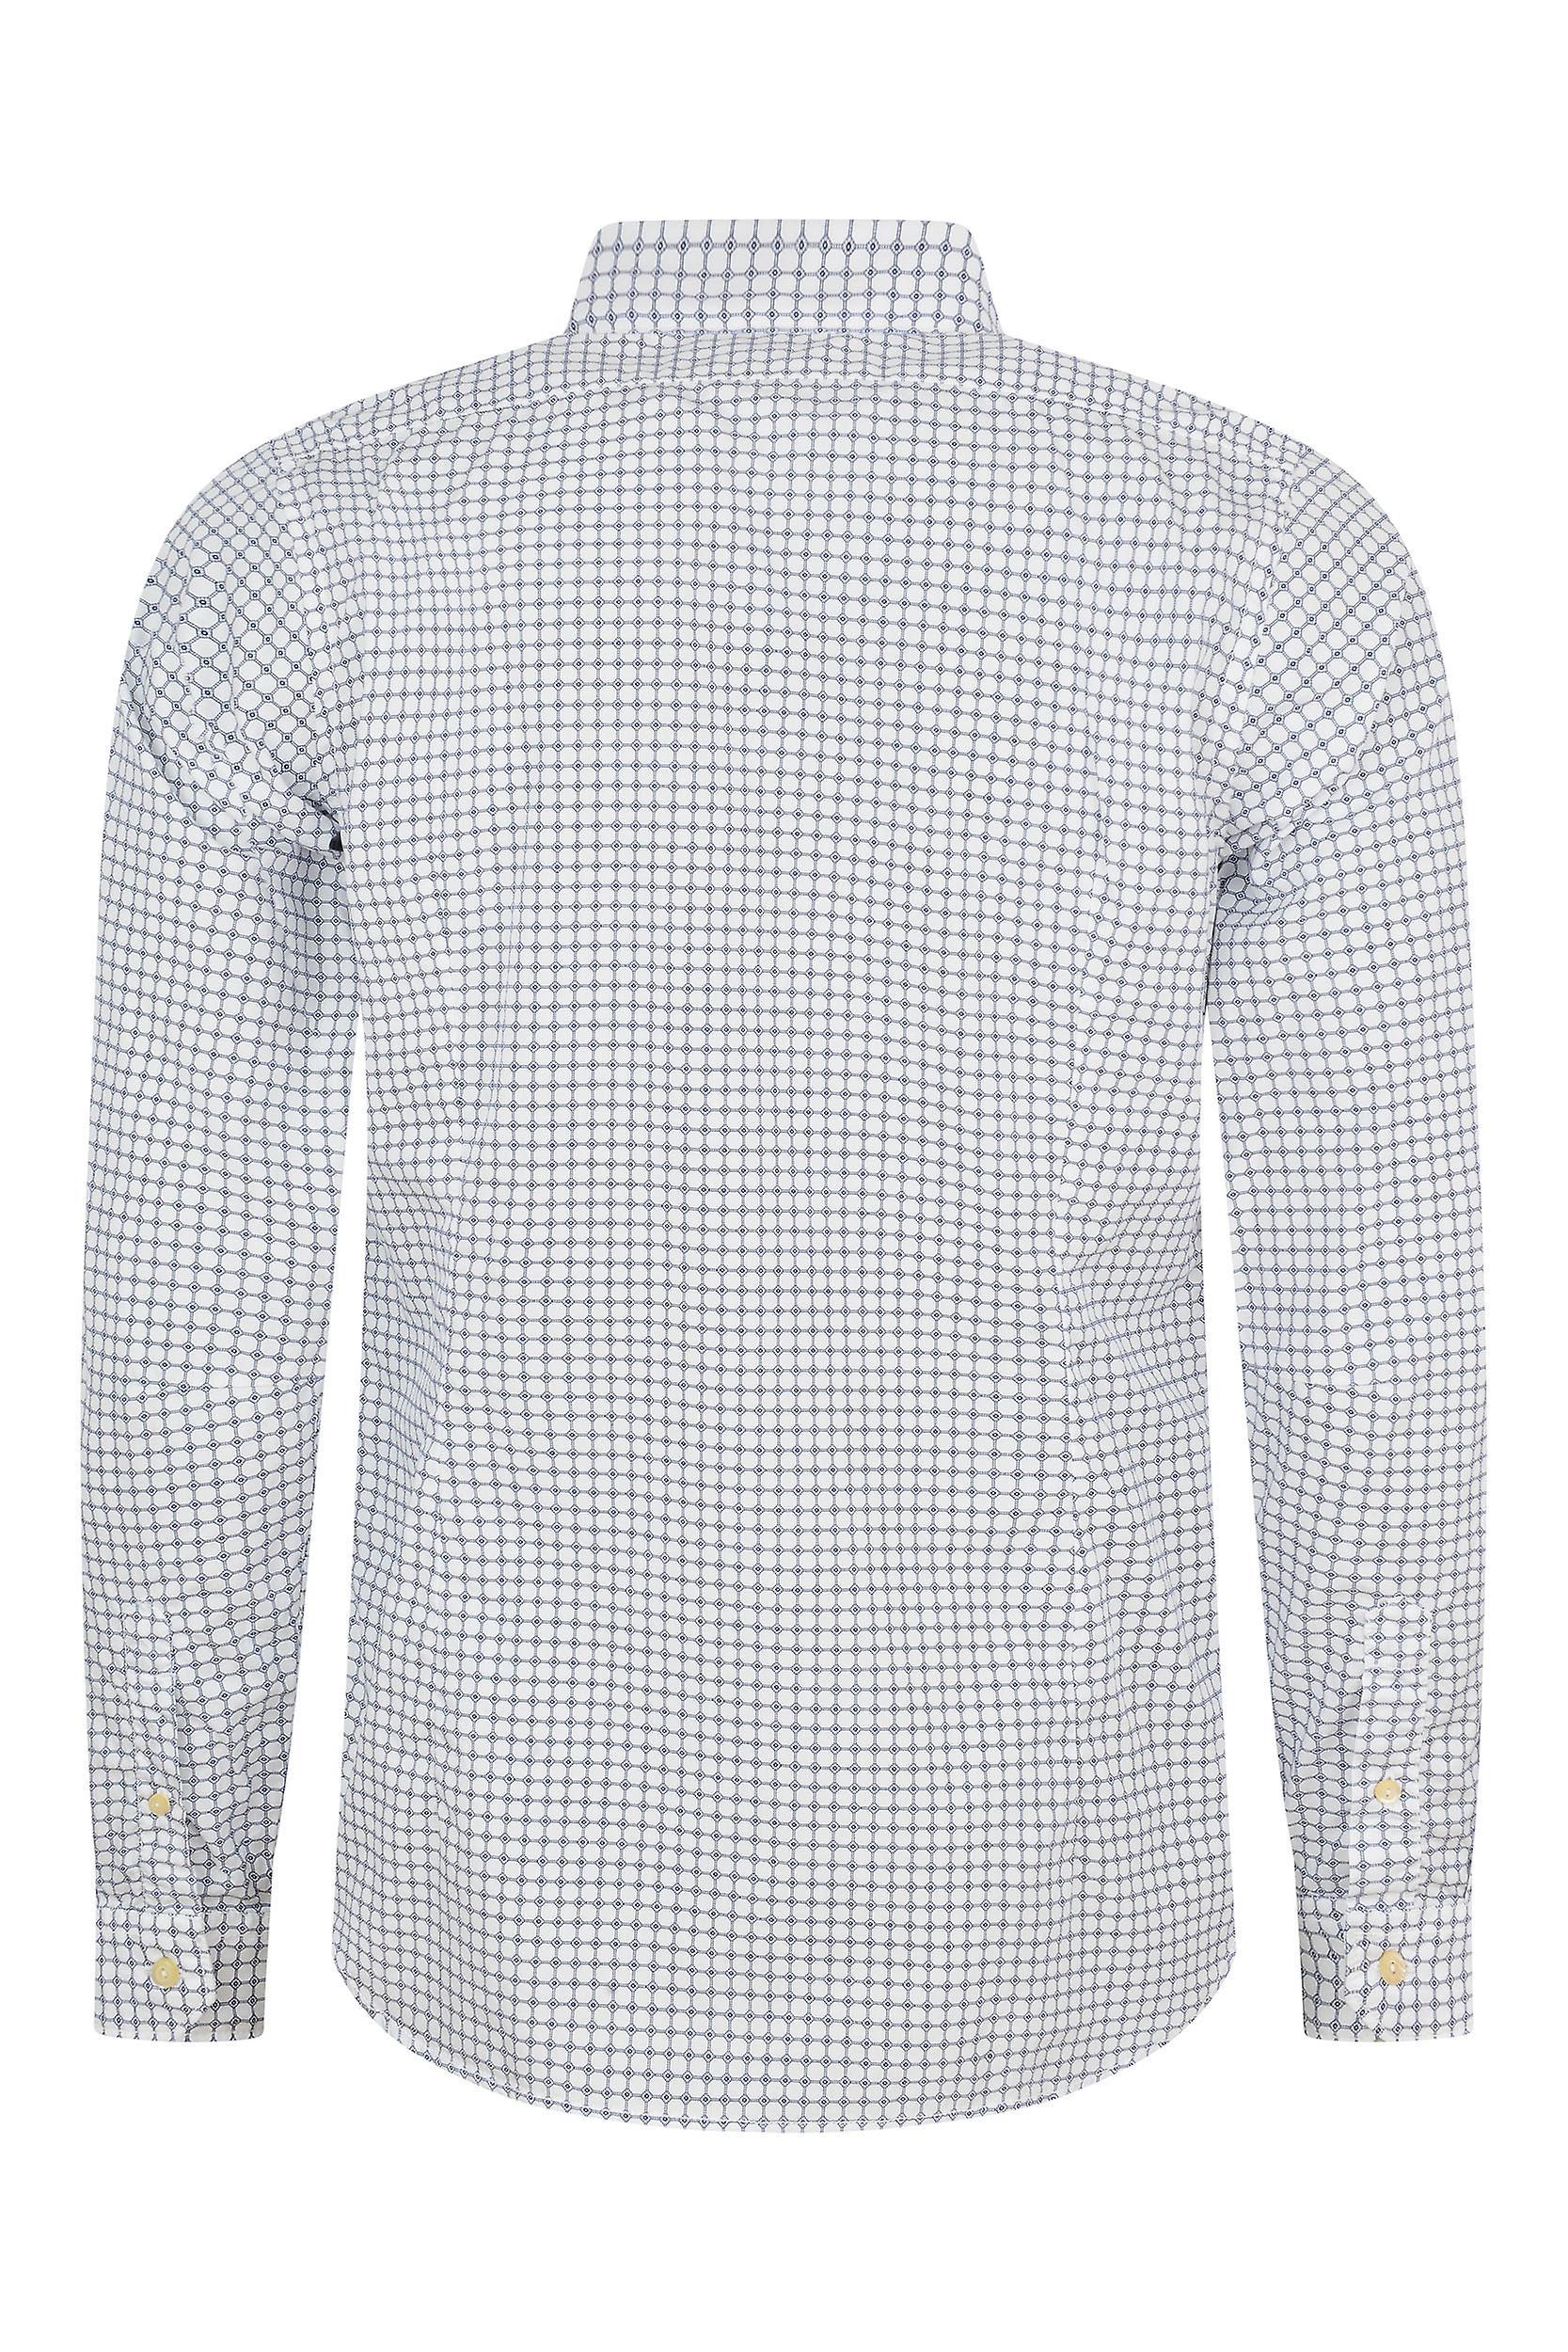 Fabio Giovanni Copertino Shirt - Mens Italian Stylish Casual Shirt - Long Sleeve